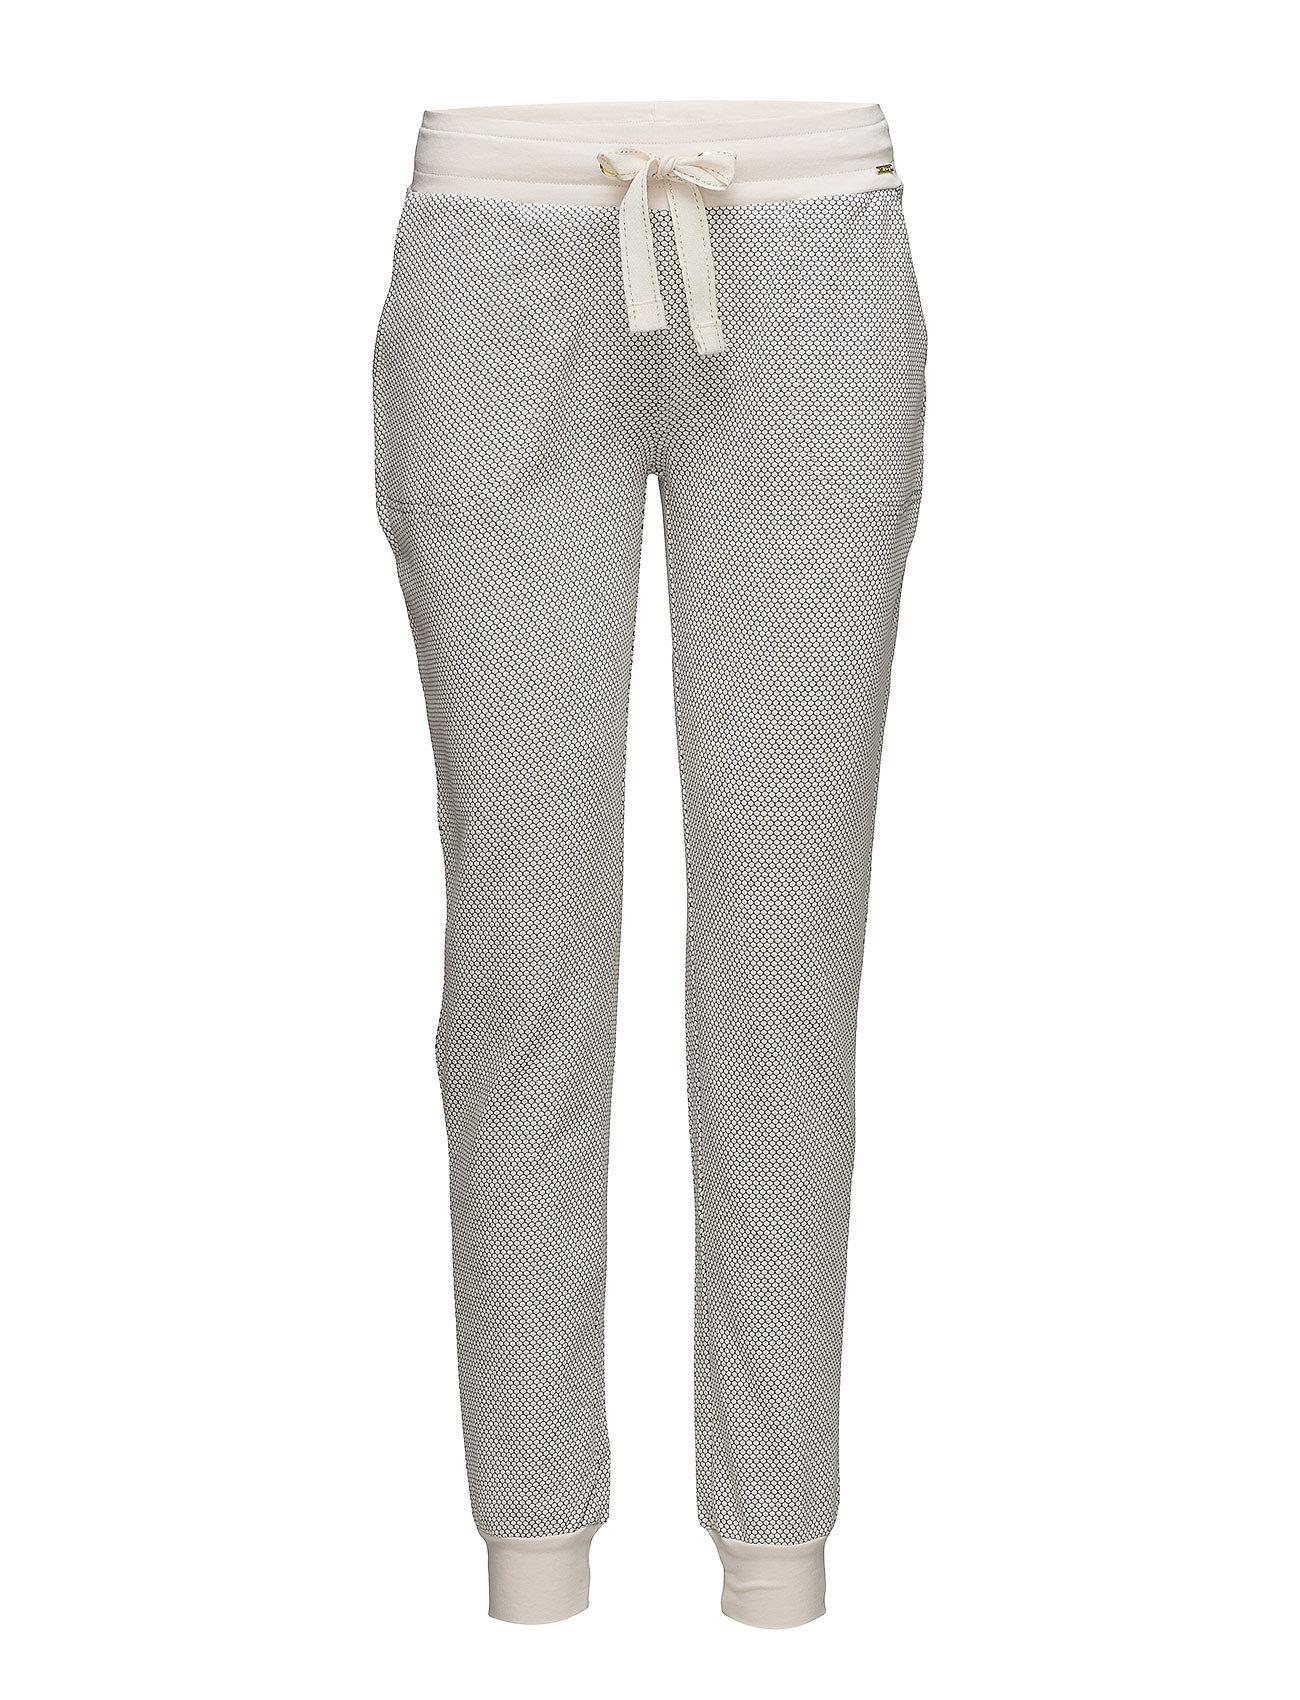 L. Pant Long Skiny Casual bukser til Damer i Champagne